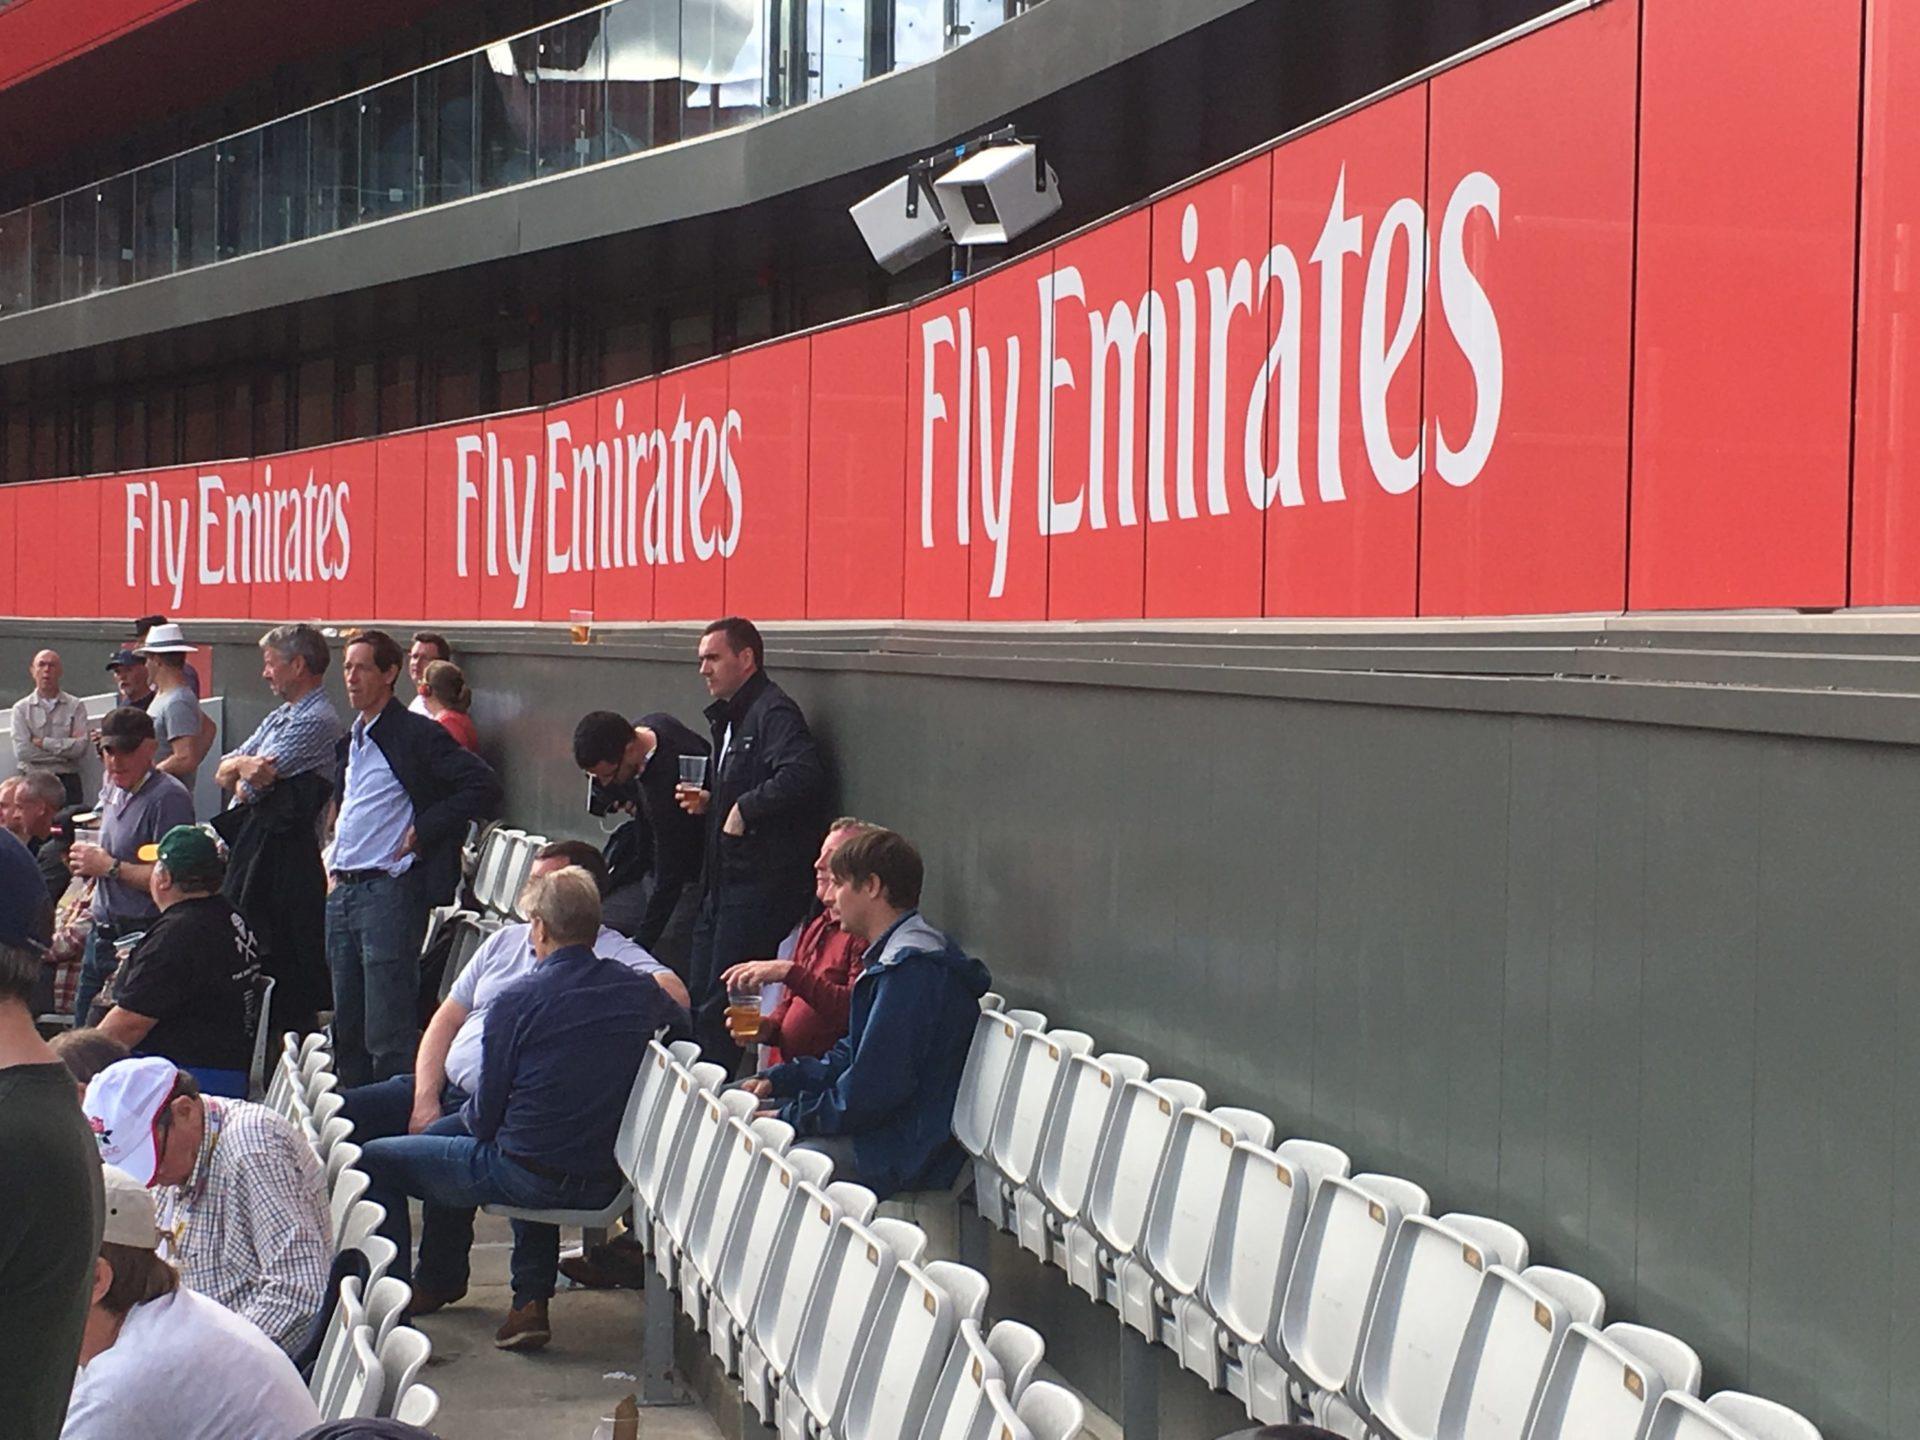 emirates-pitch-surround-perforated-vinyl